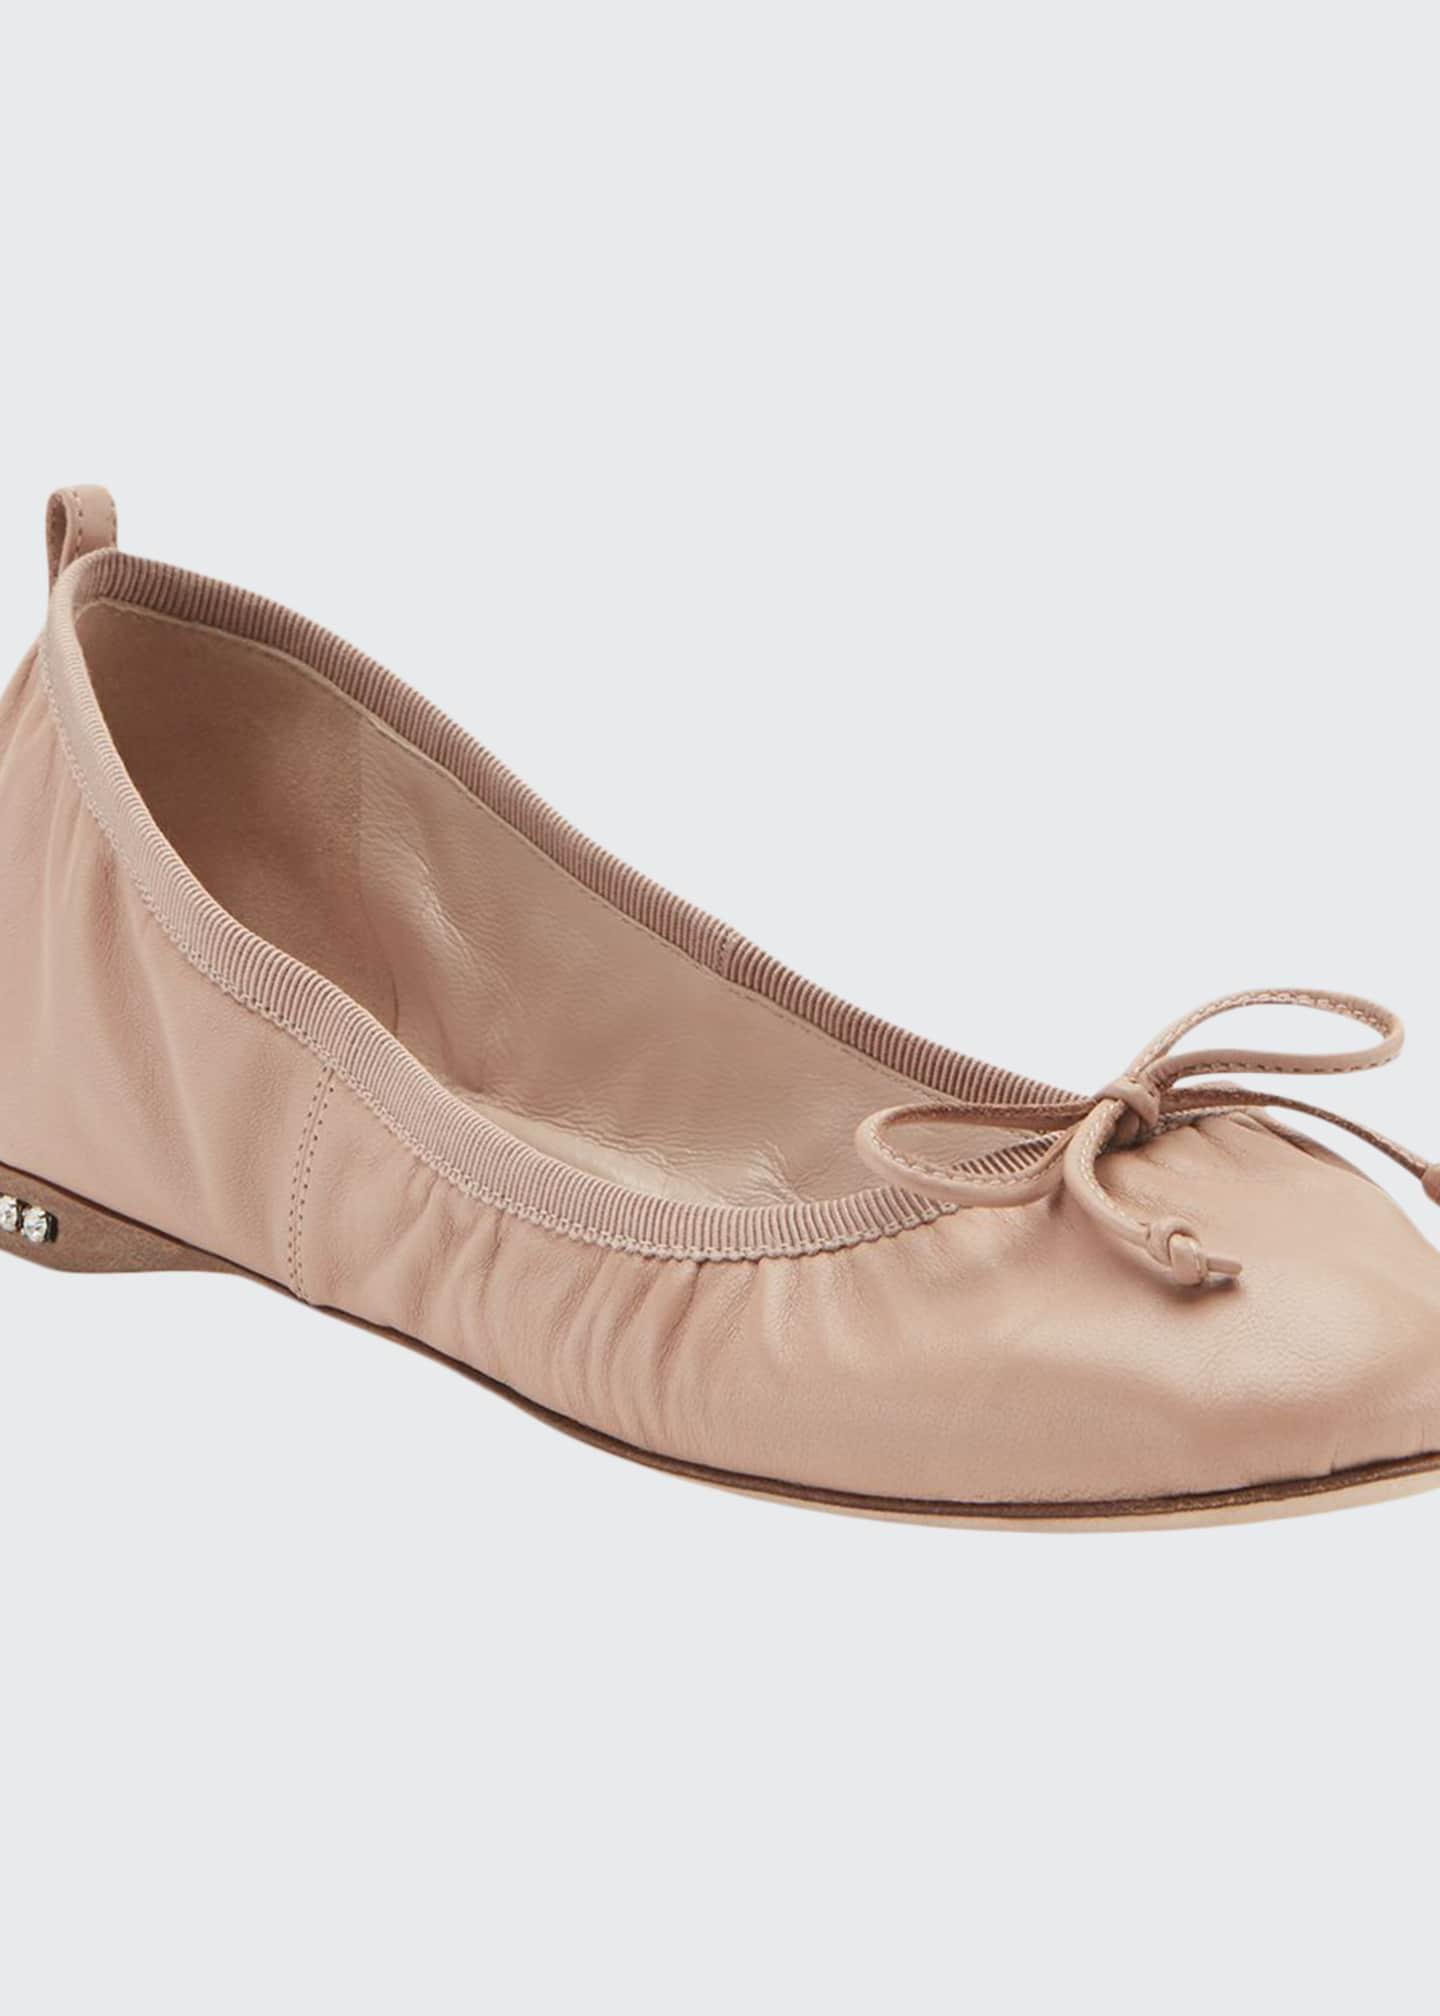 Miu Miu Flat Leather Ballet Flats with Jeweled